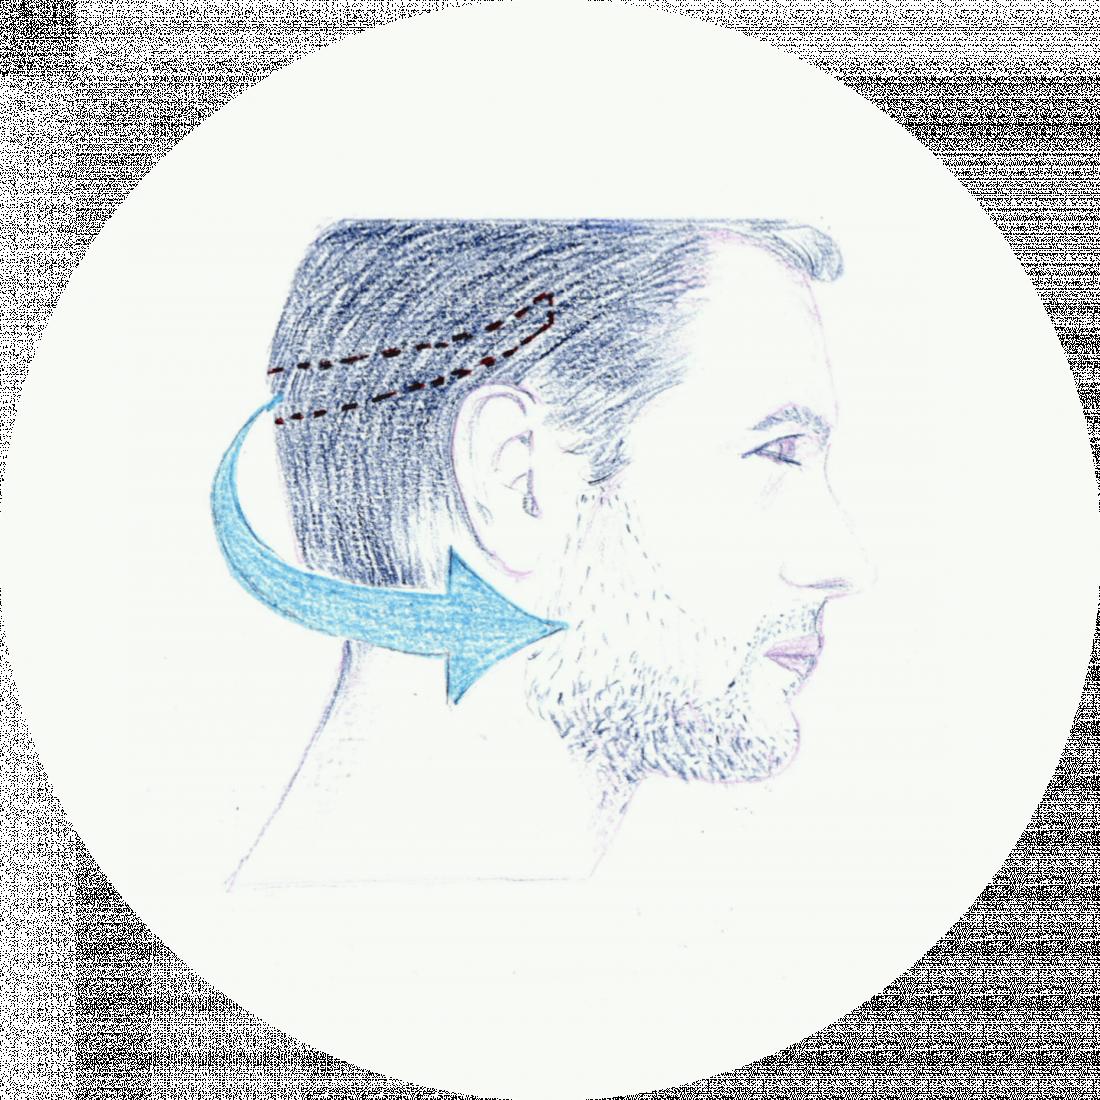 Procedure details: Beard Transplantation